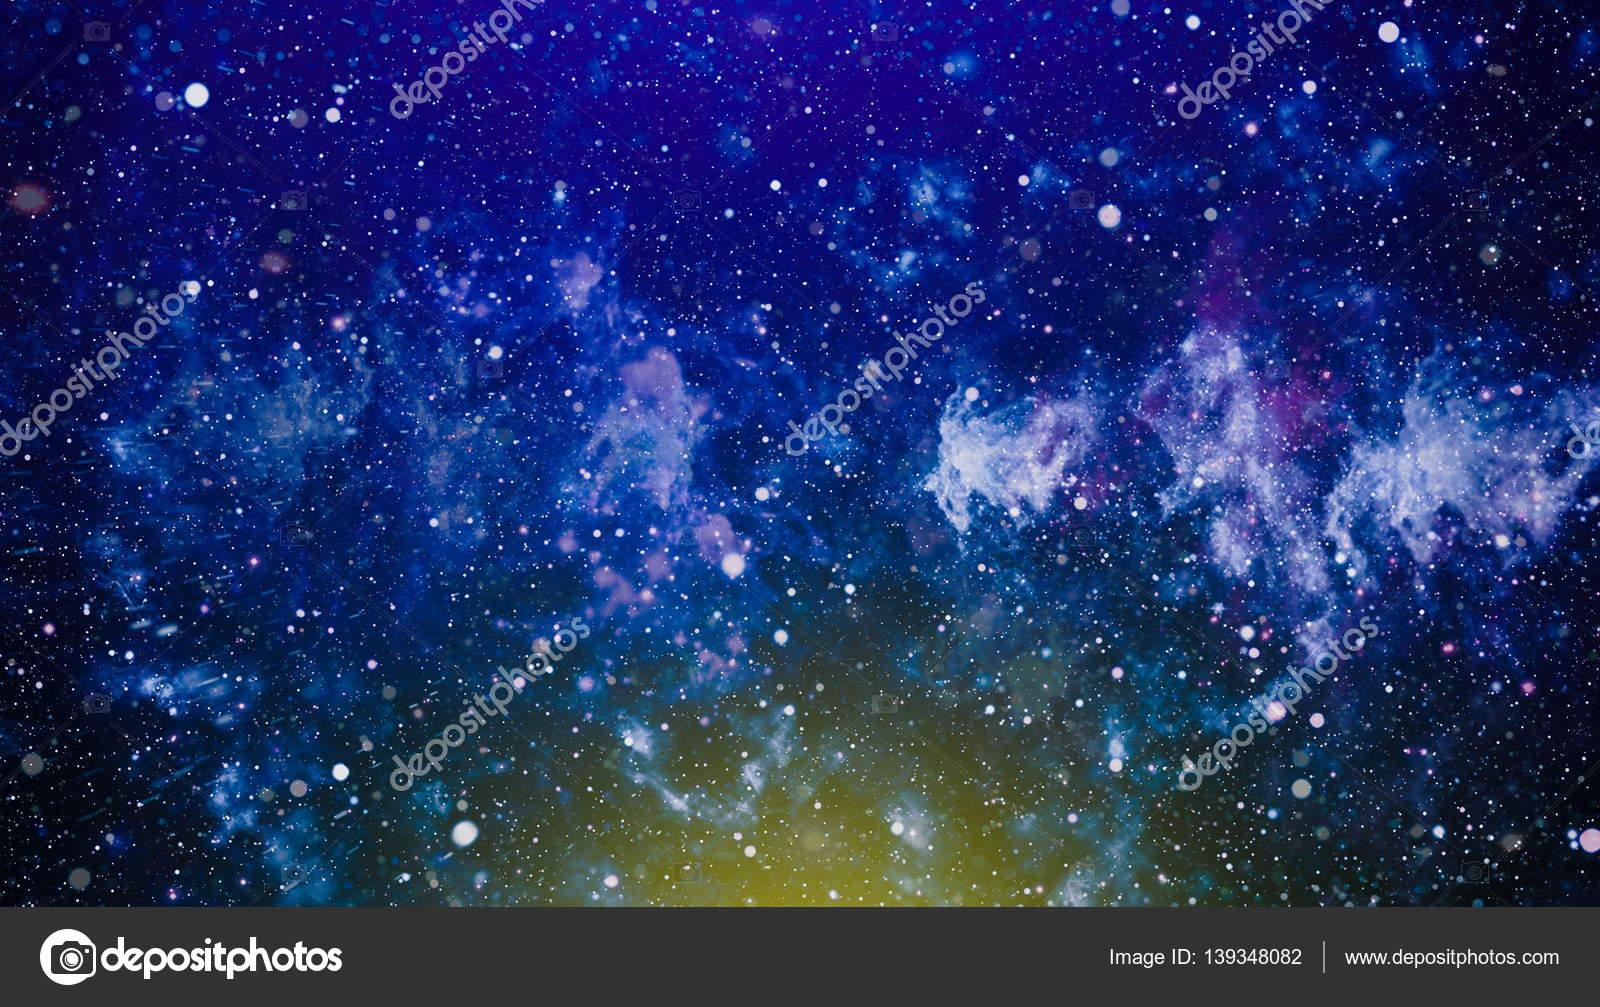 Yıldızlı Uzay Arka Plan Dokusu Stok Foto Maximusdn 139348082